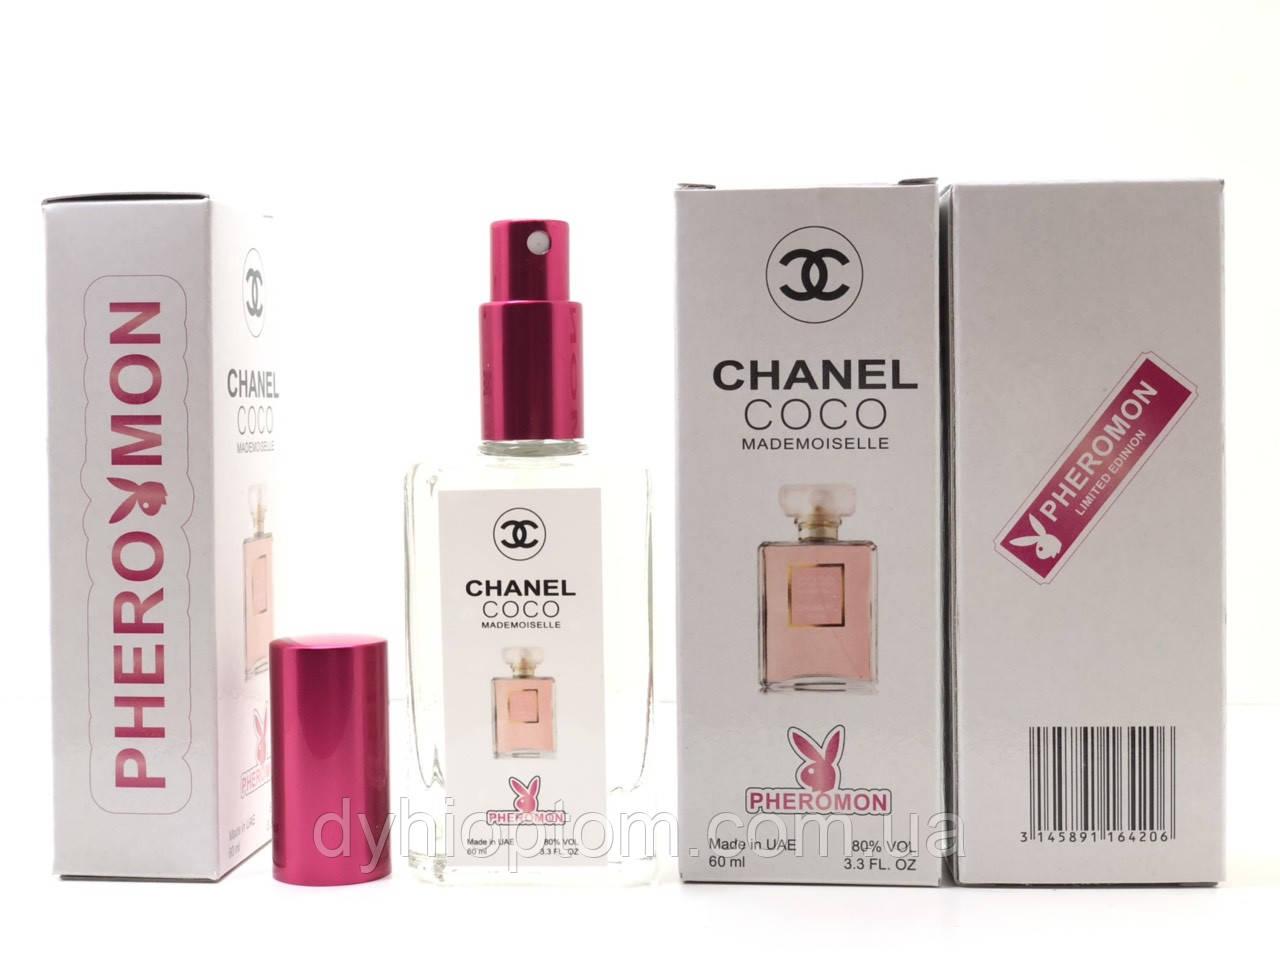 Женский парфюм Chanel Coco Mademoiselle, 60 ml